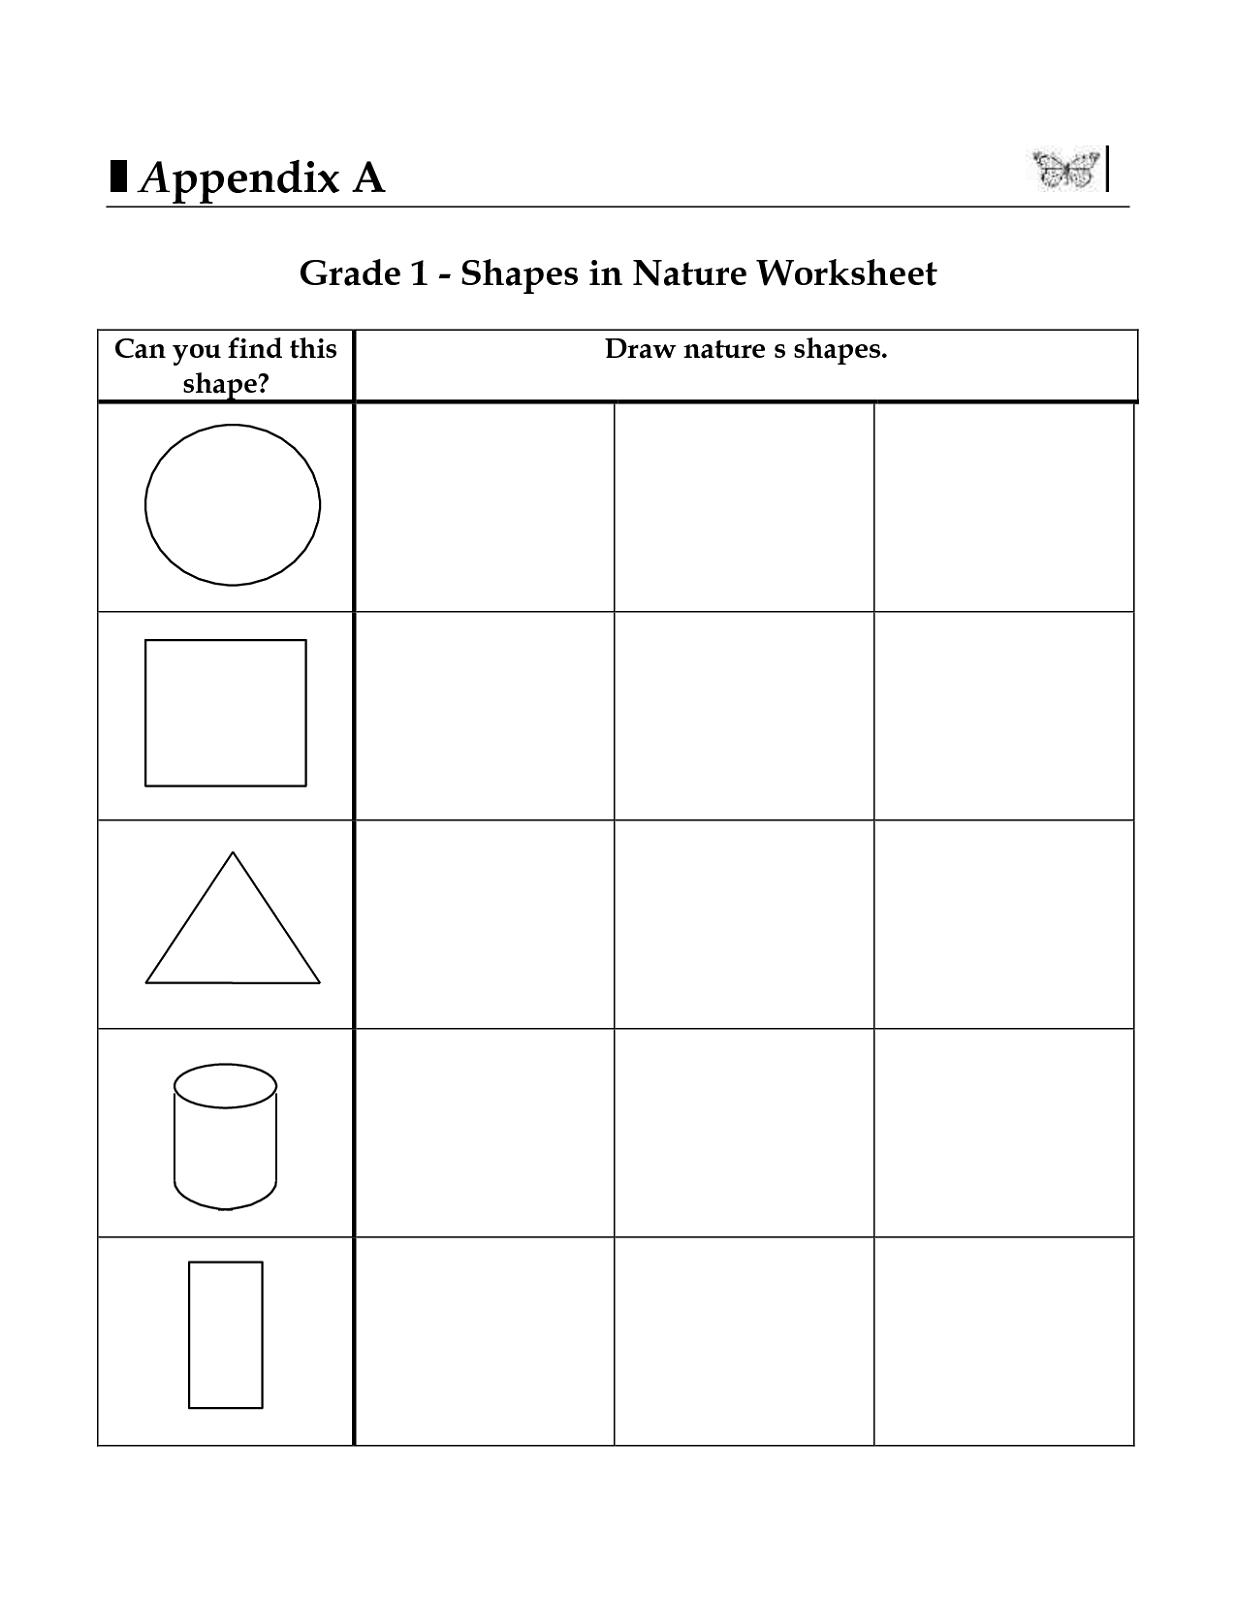 Math Worksheets For Grade 1 On Shapes 1246687